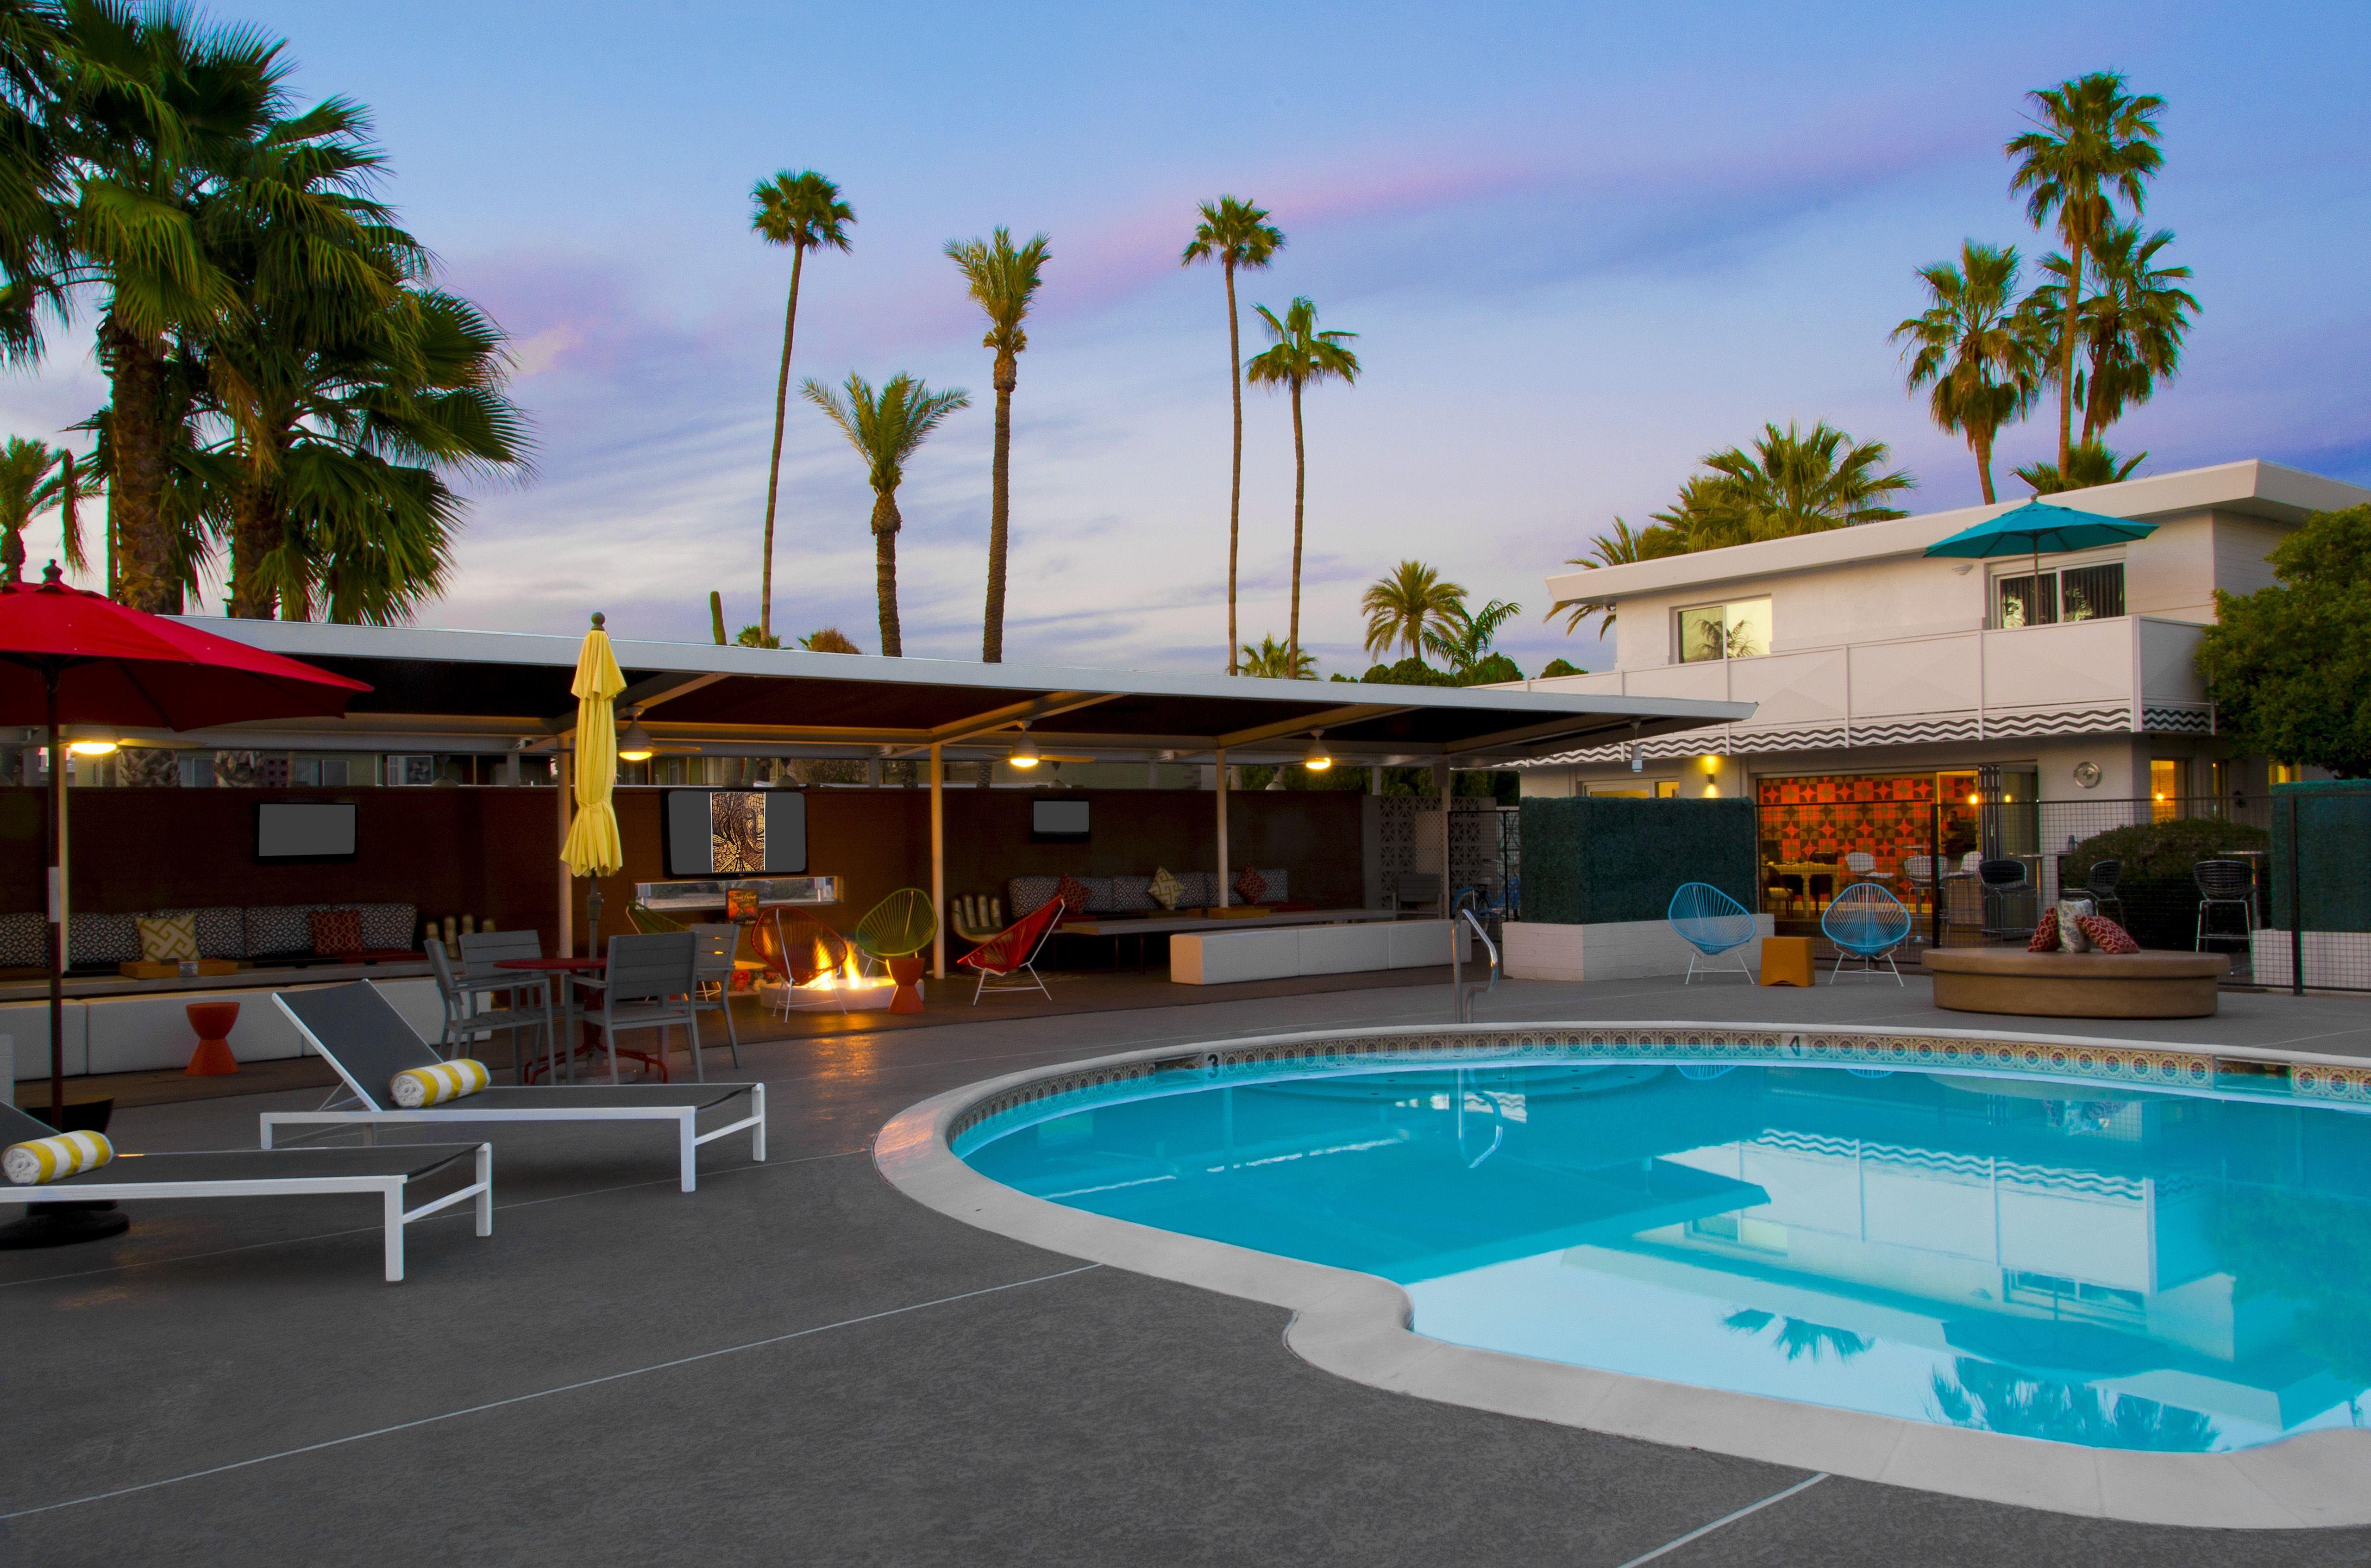 A beautiful evening poolside at El Dorado Scottsdale. #Vacation #Hotel #Pool #Summer #Arizona #Scottsdale #Travel